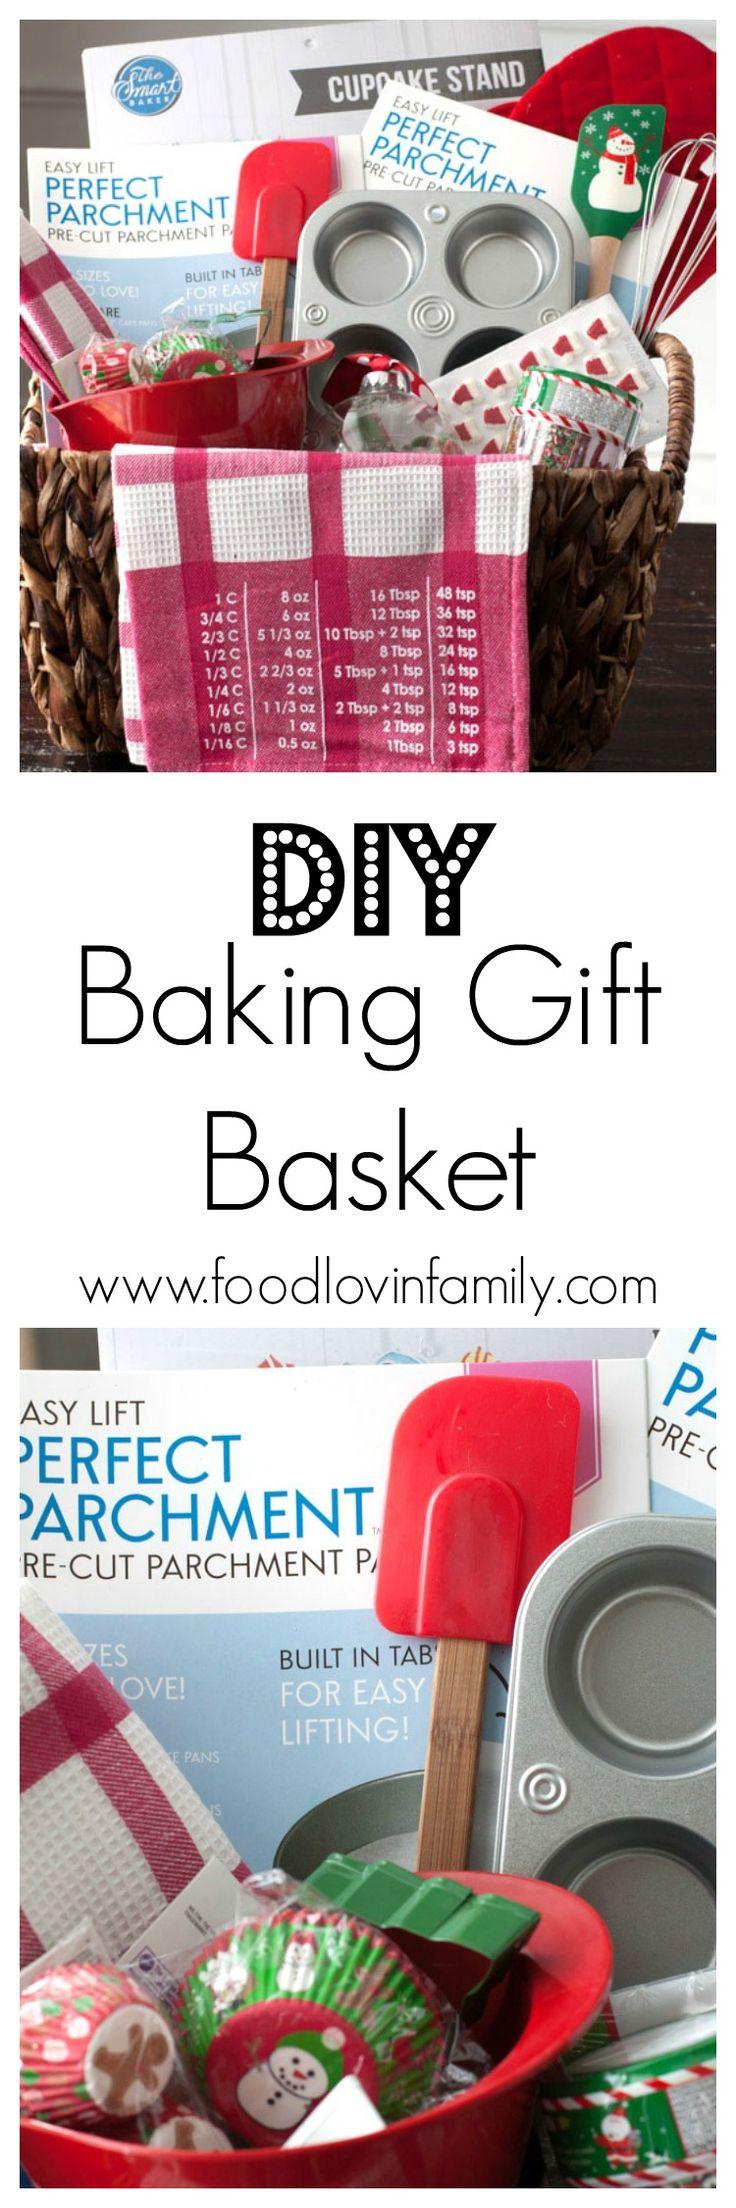 DIY Baking Gift Basket. Ideas for putting together a baking gift basket| http://www.foodlovinfamily.com/diy-baking-gift-basket/